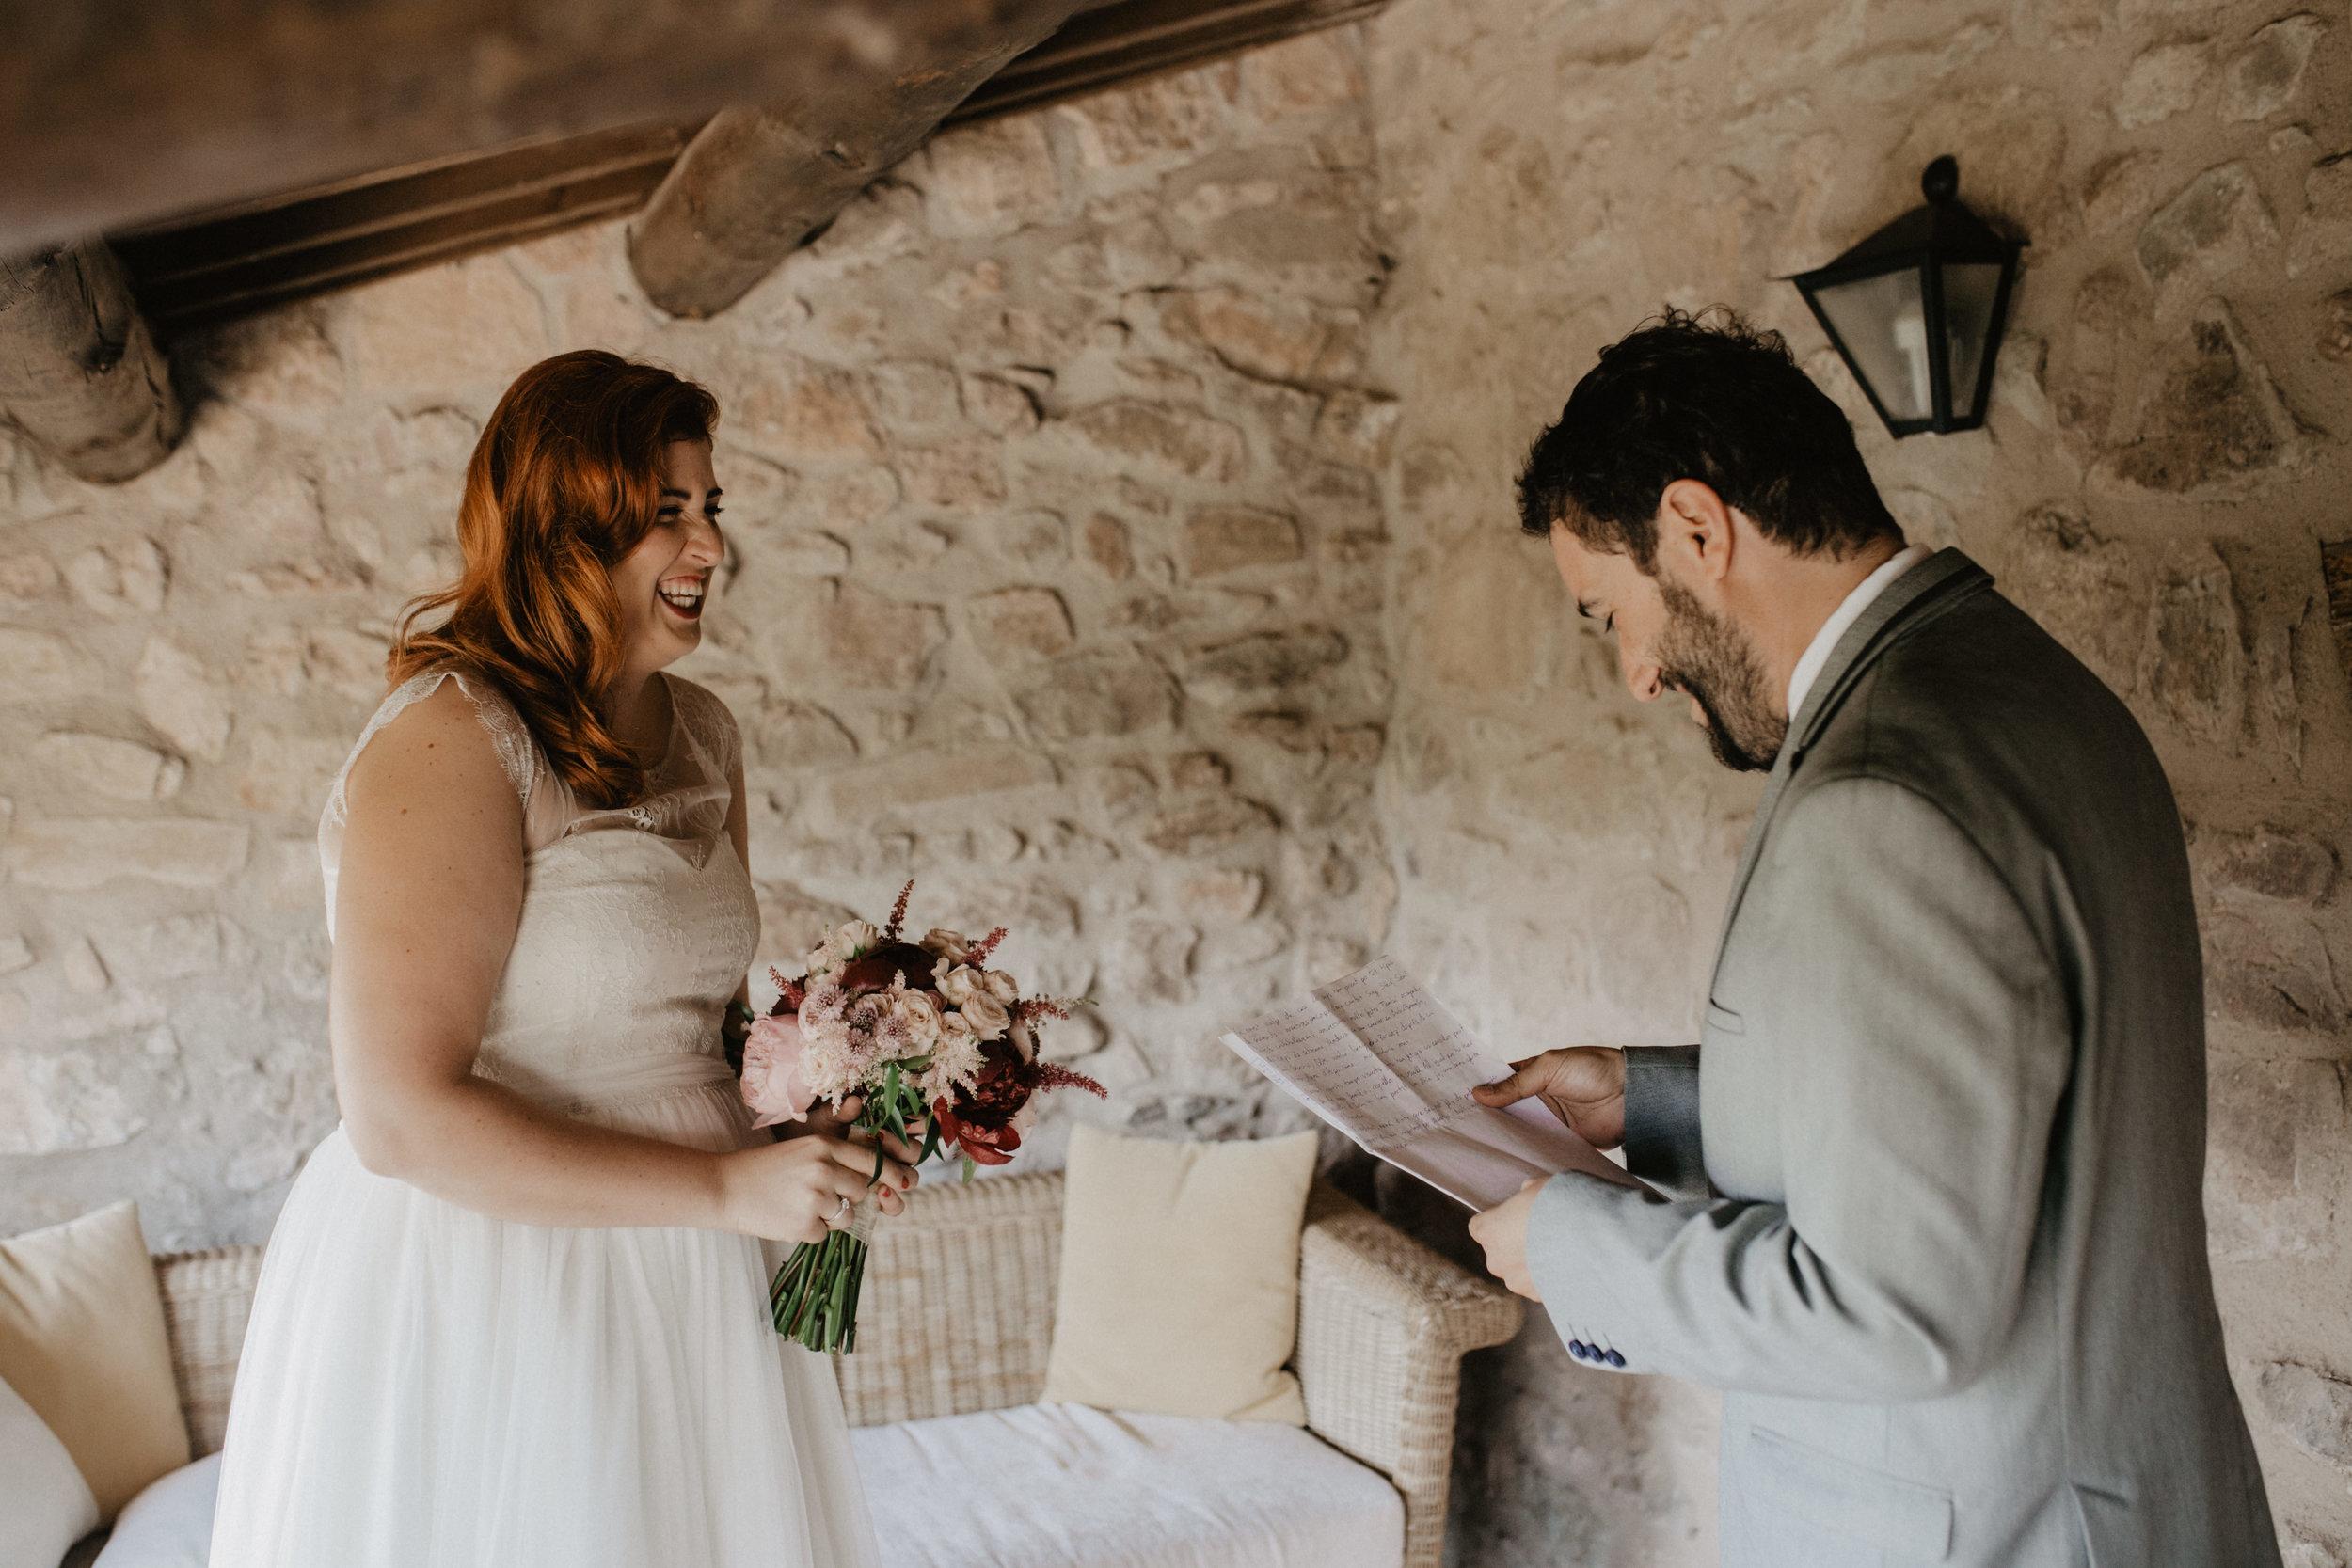 thenortherngirlphotography_photography_thenortherngirl_rebeccascabros_wedding_weddingphotography_masialagarrigadecastelladral_joaniemma_bodaenbarcelona_weddingphotographer_emmaijoan-152.jpg